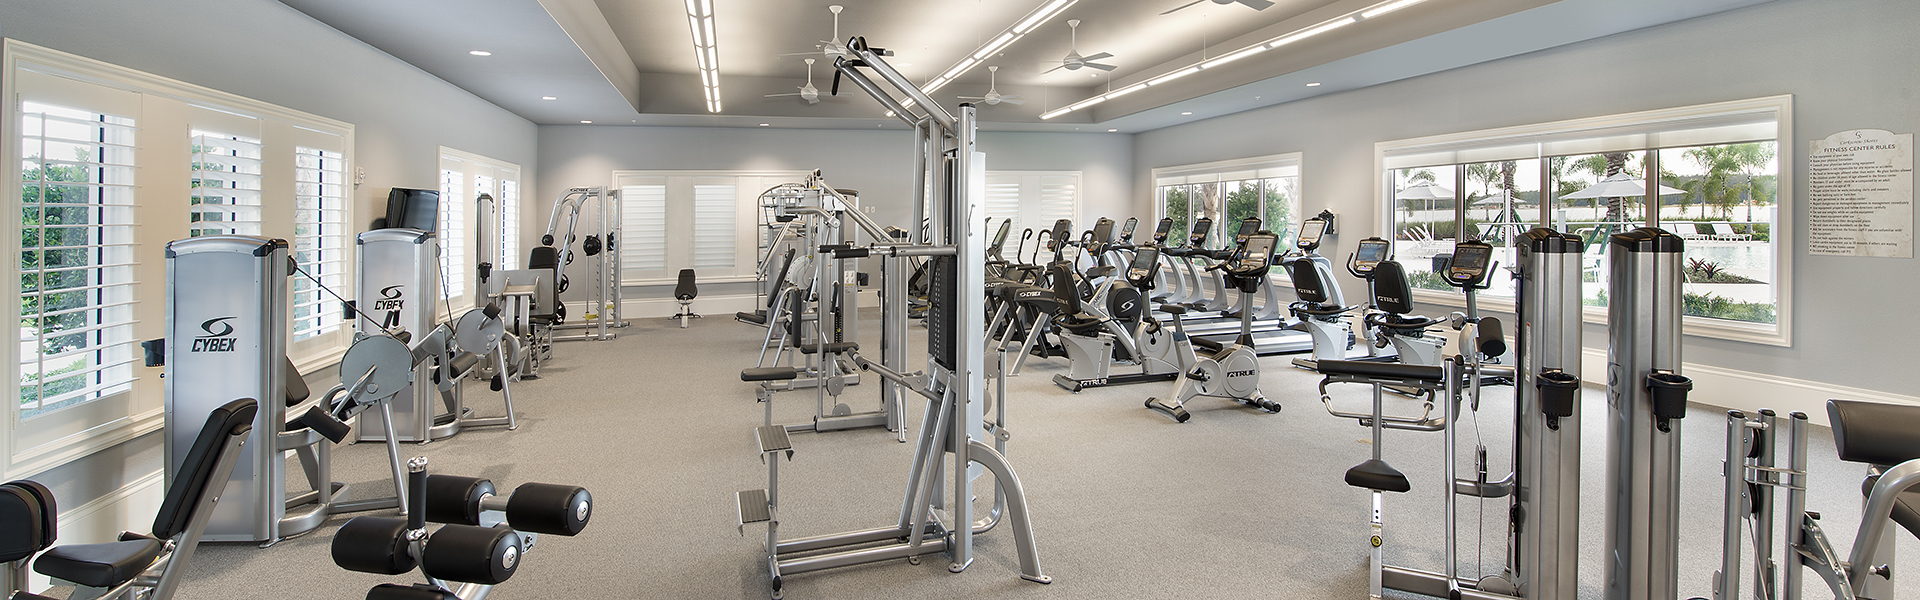 10-Fitness